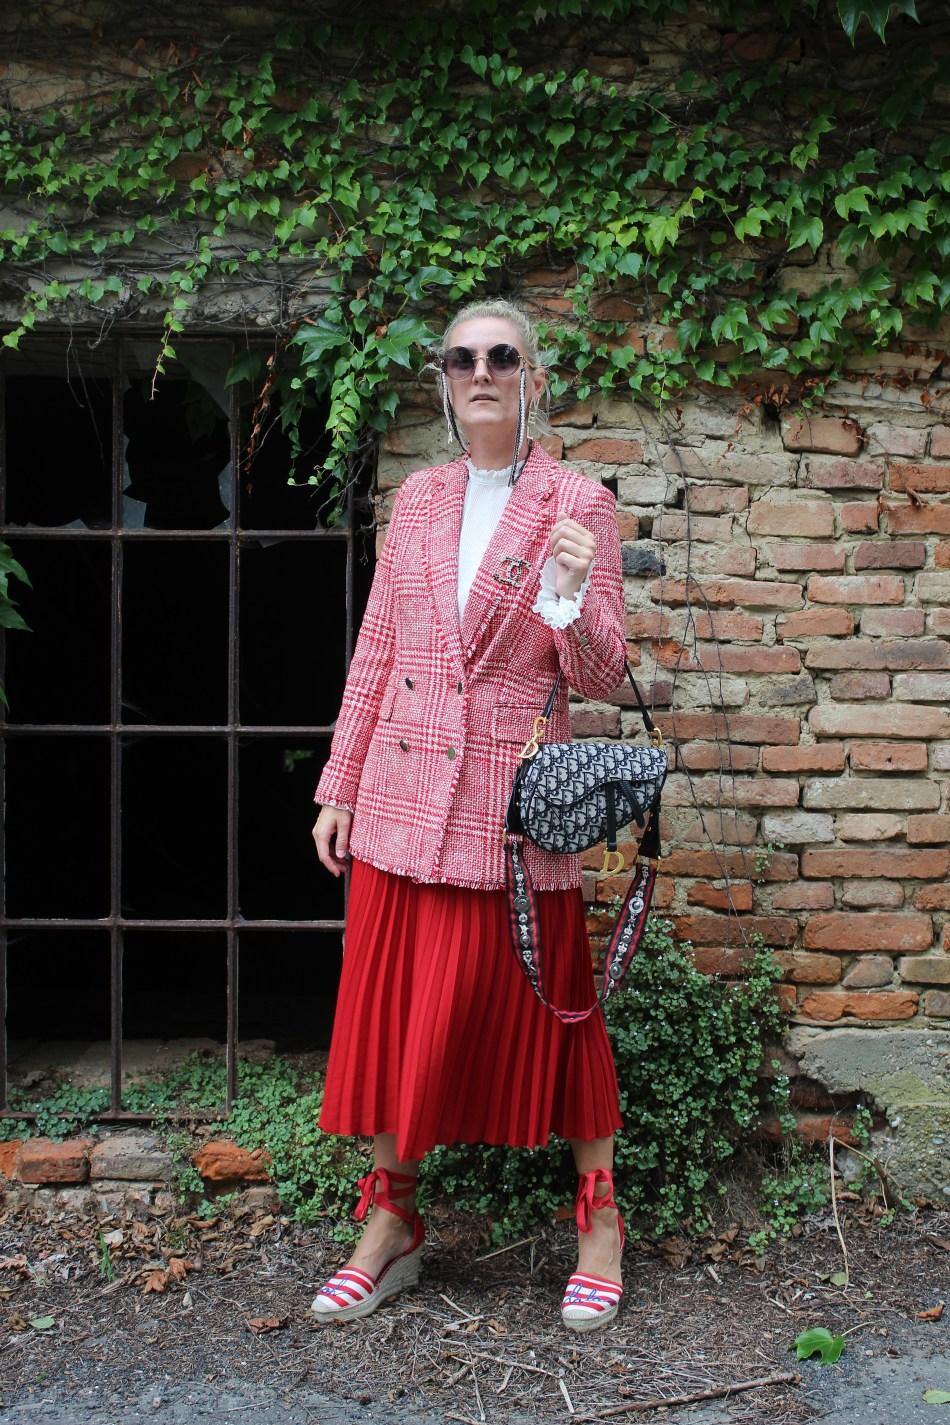 Übergangsjacken-Trend-Plissee-Rock-Dior-Saddlebag-Espadrilles-Chanel-Sonnenbrille-Carrieslifestyle-Tamara-PRutsch